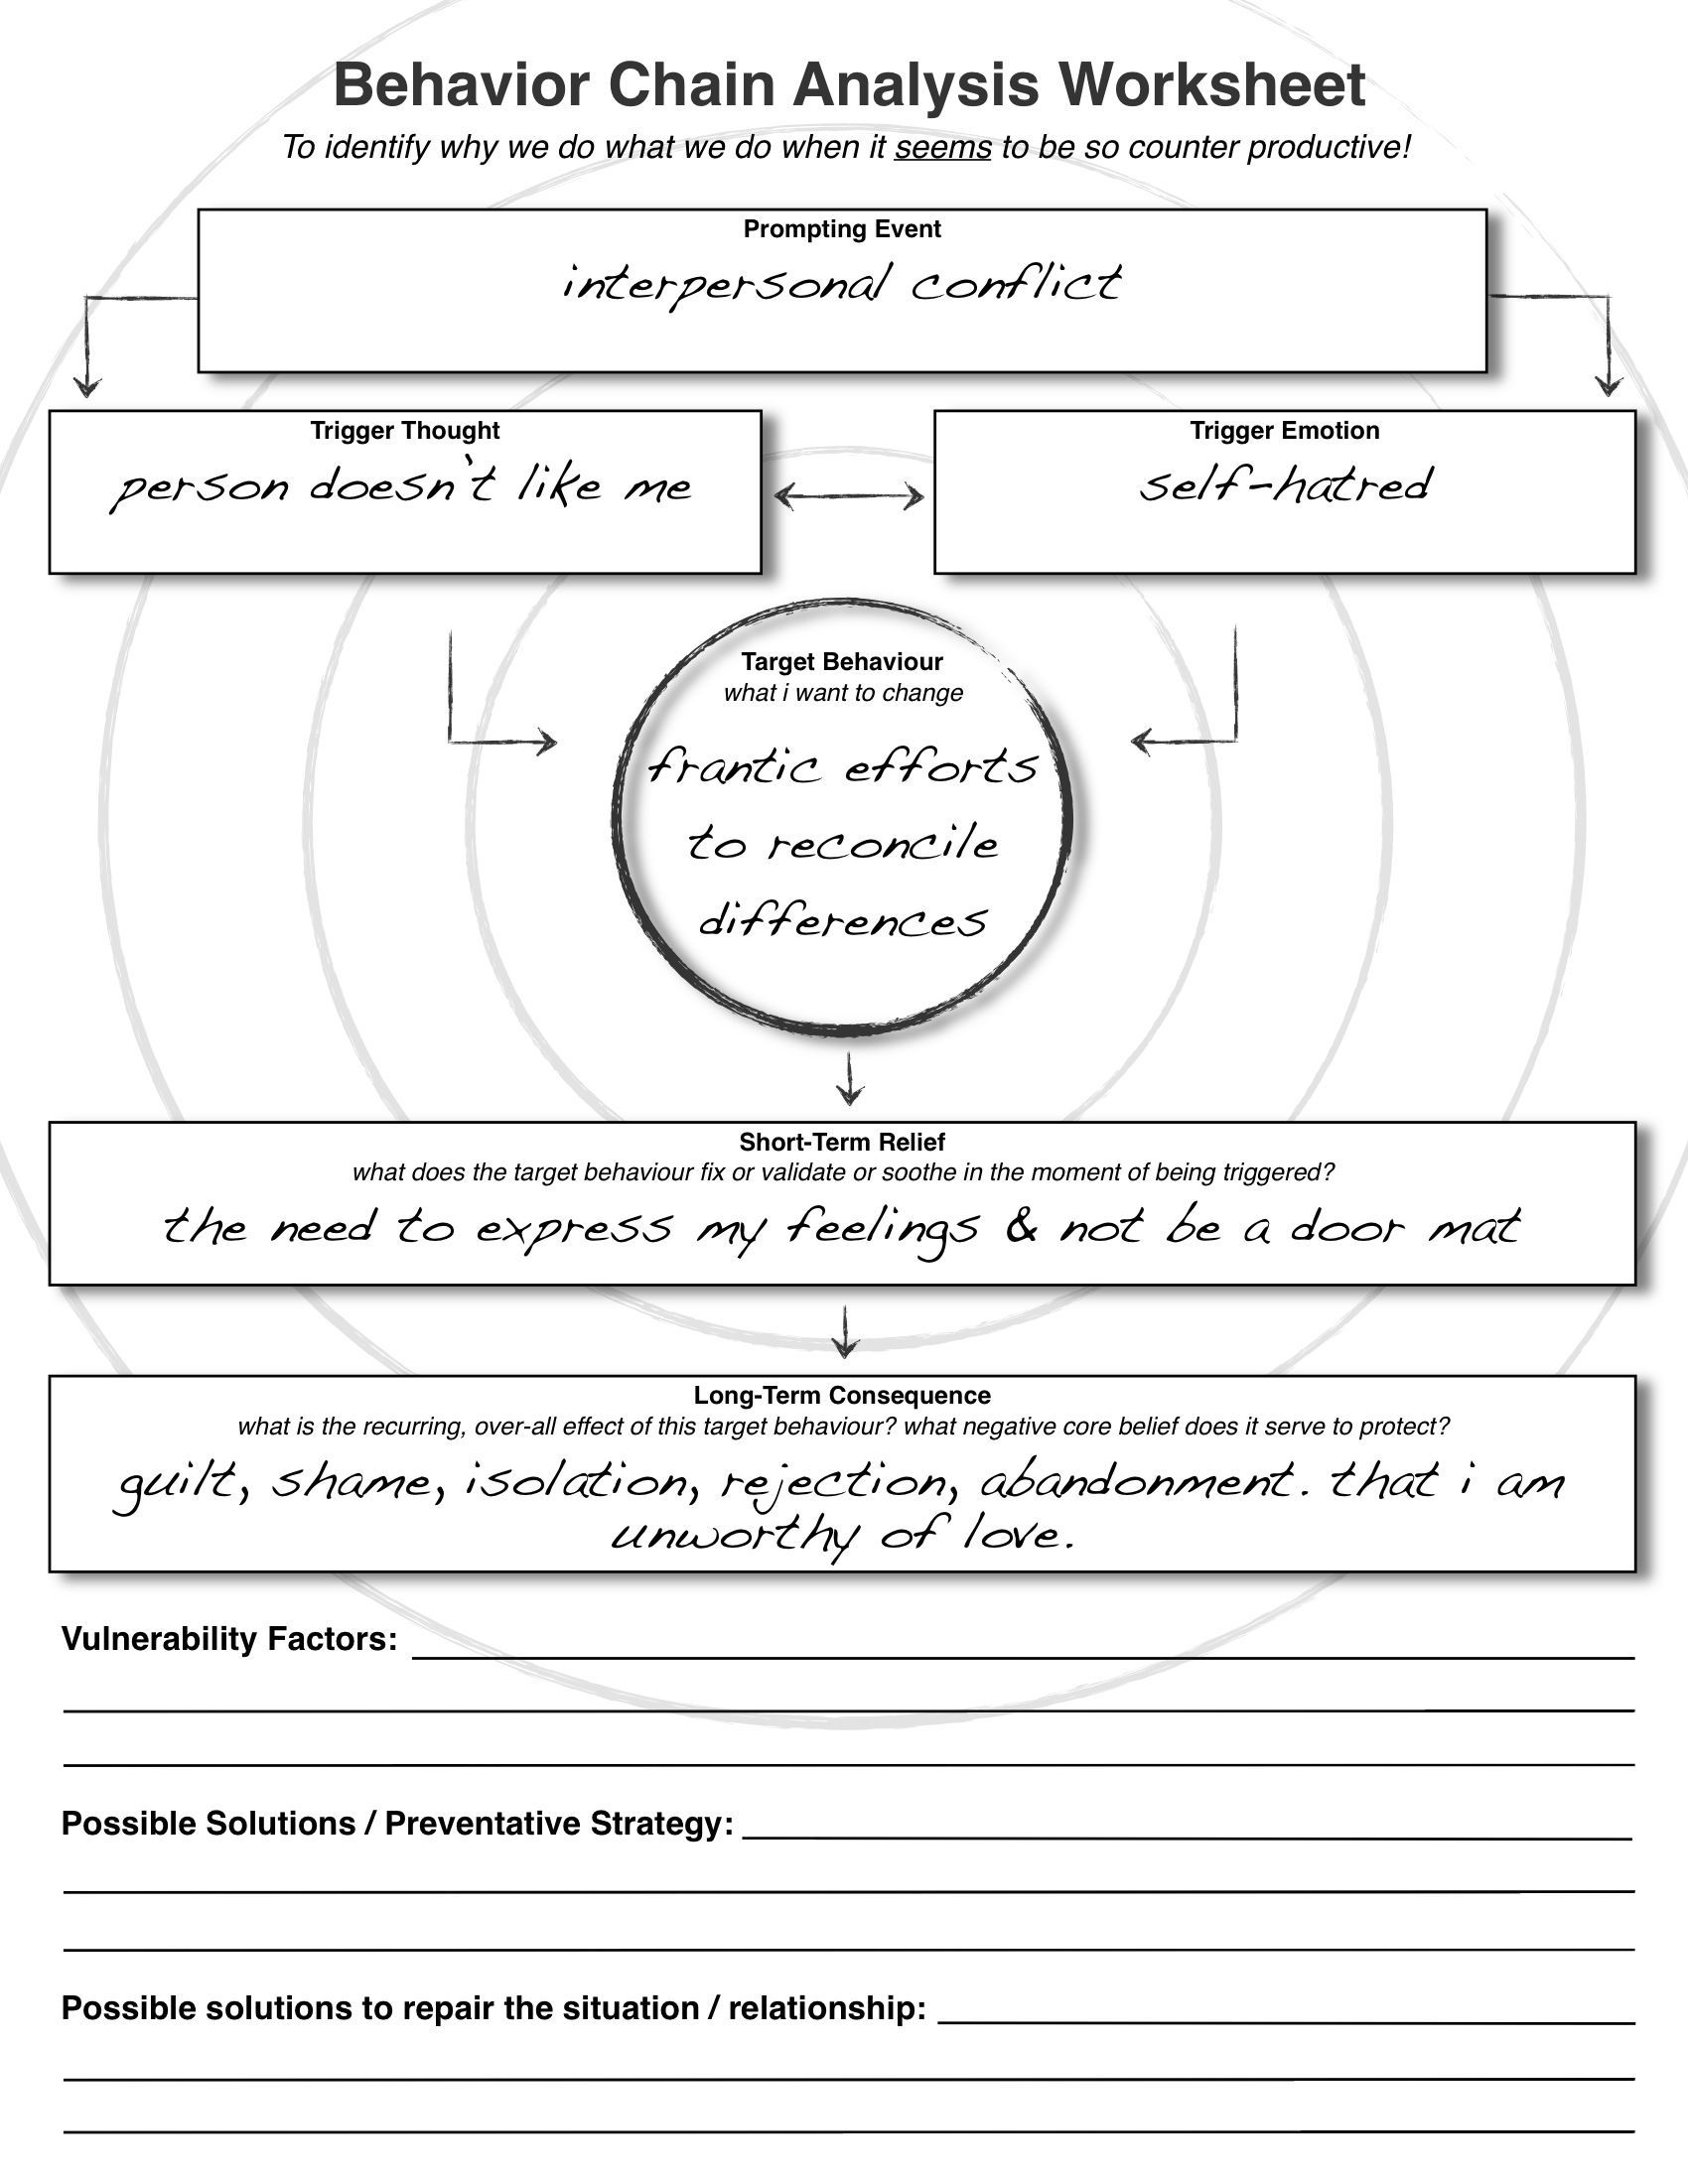 Behavior Chain Worksheet In